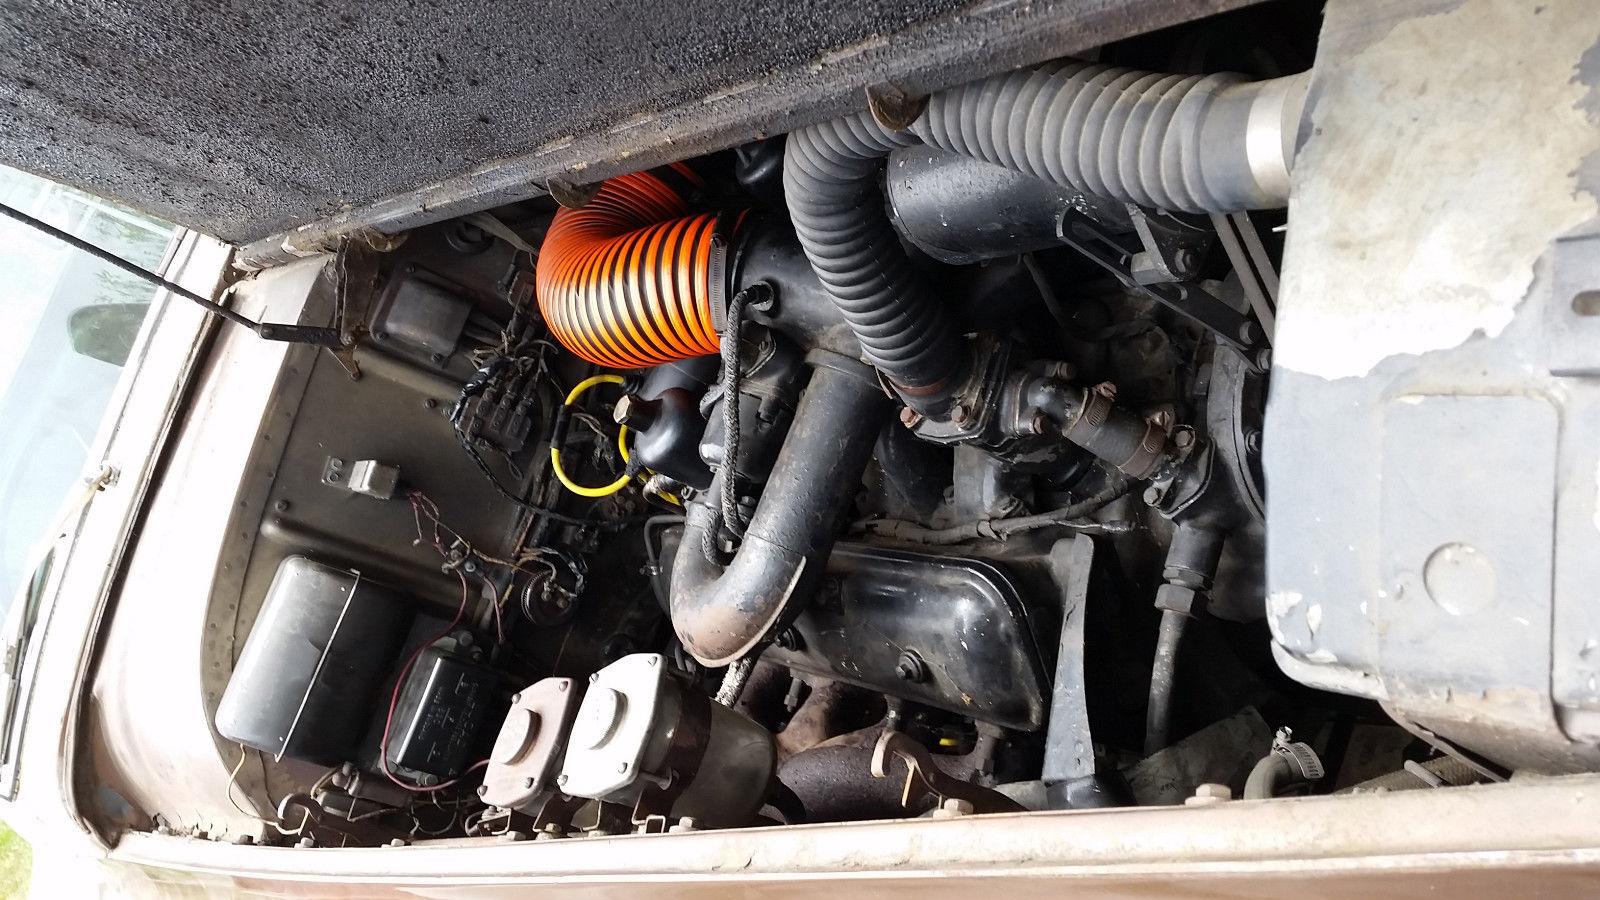 1960 Rolls Royce Silver Cloud Ii Rare Find Sunroof Power Windows Fuel Pump Prevnext